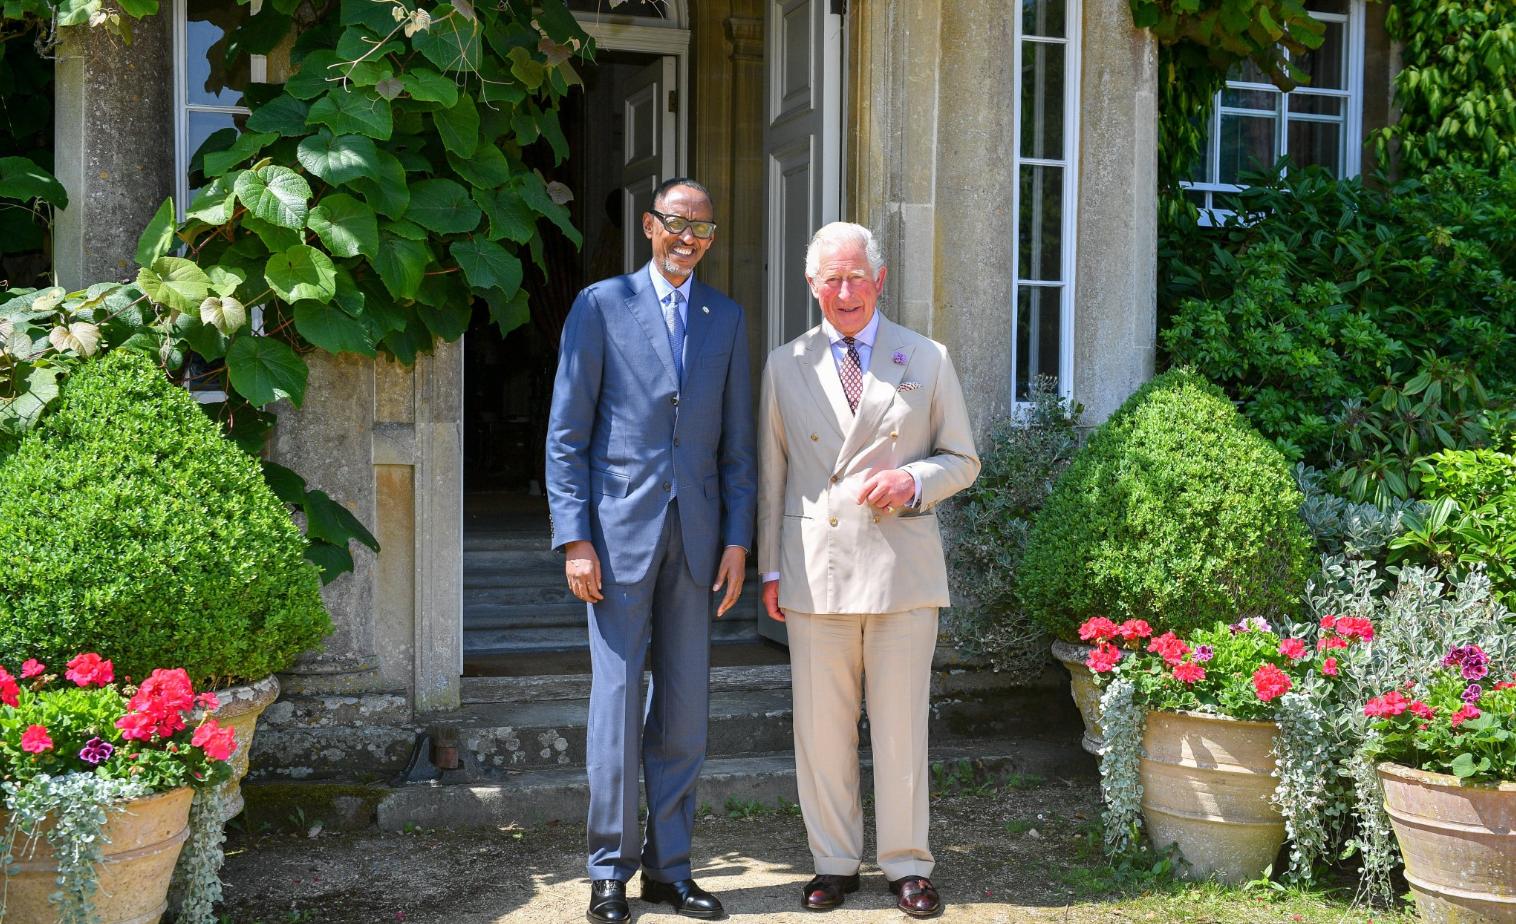 principe carlos e presidente do ruanda.PNG